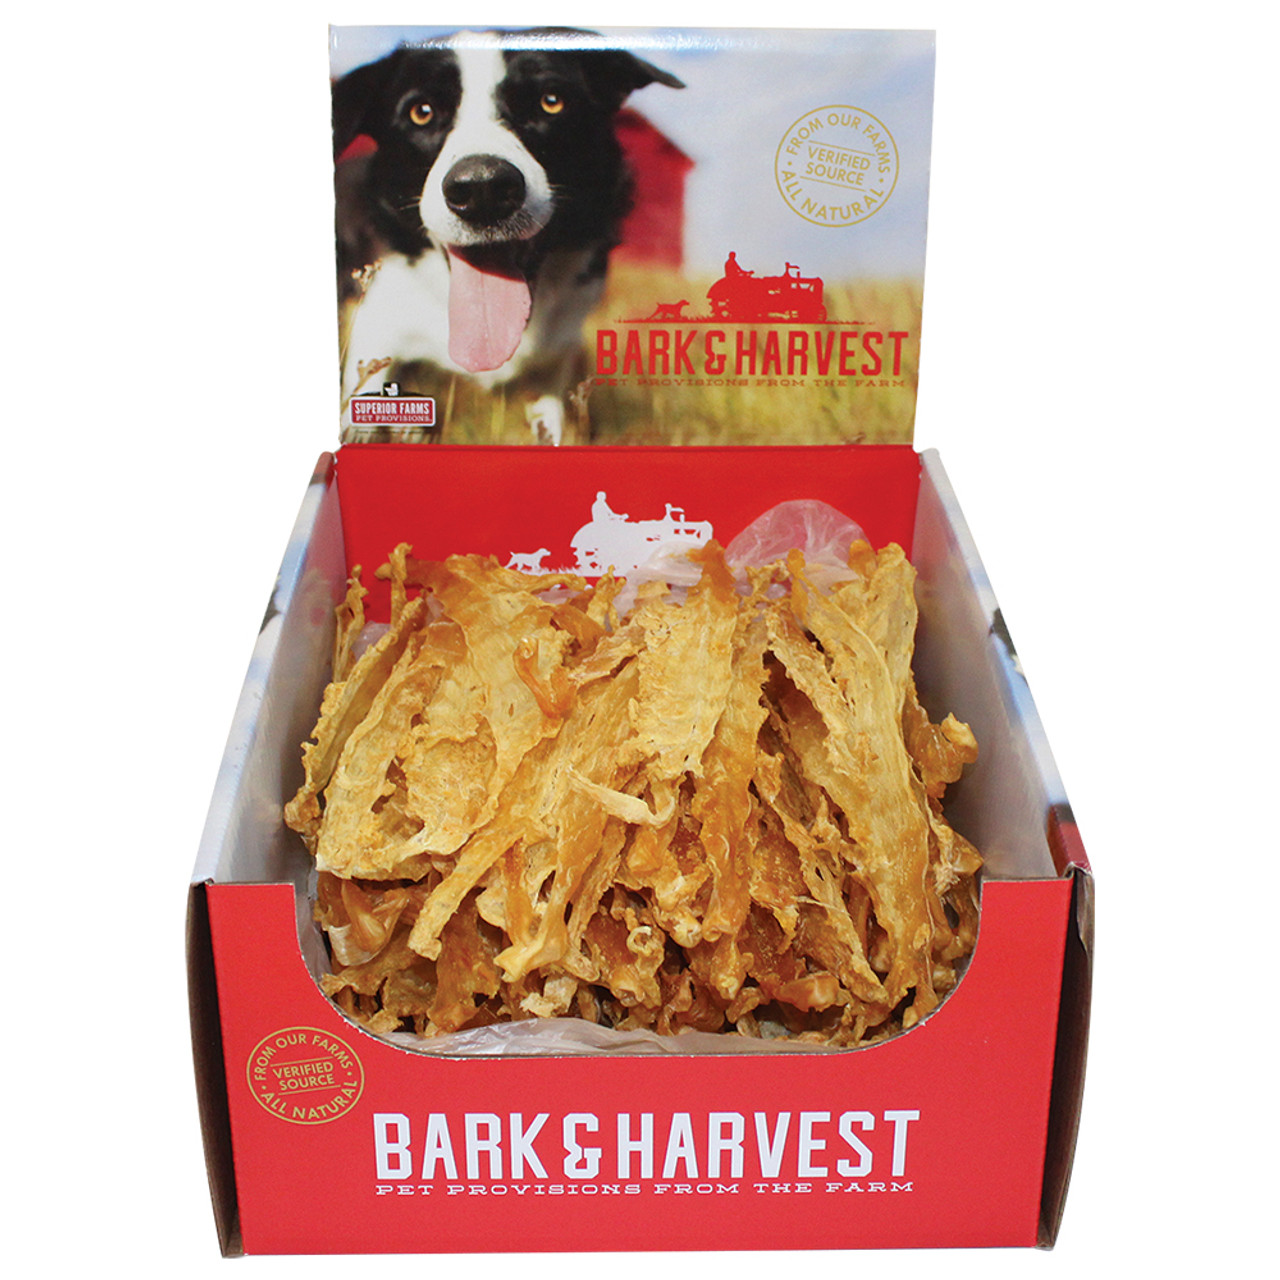 Bark & Harvest Turkey Tendon Dog Chew Treat